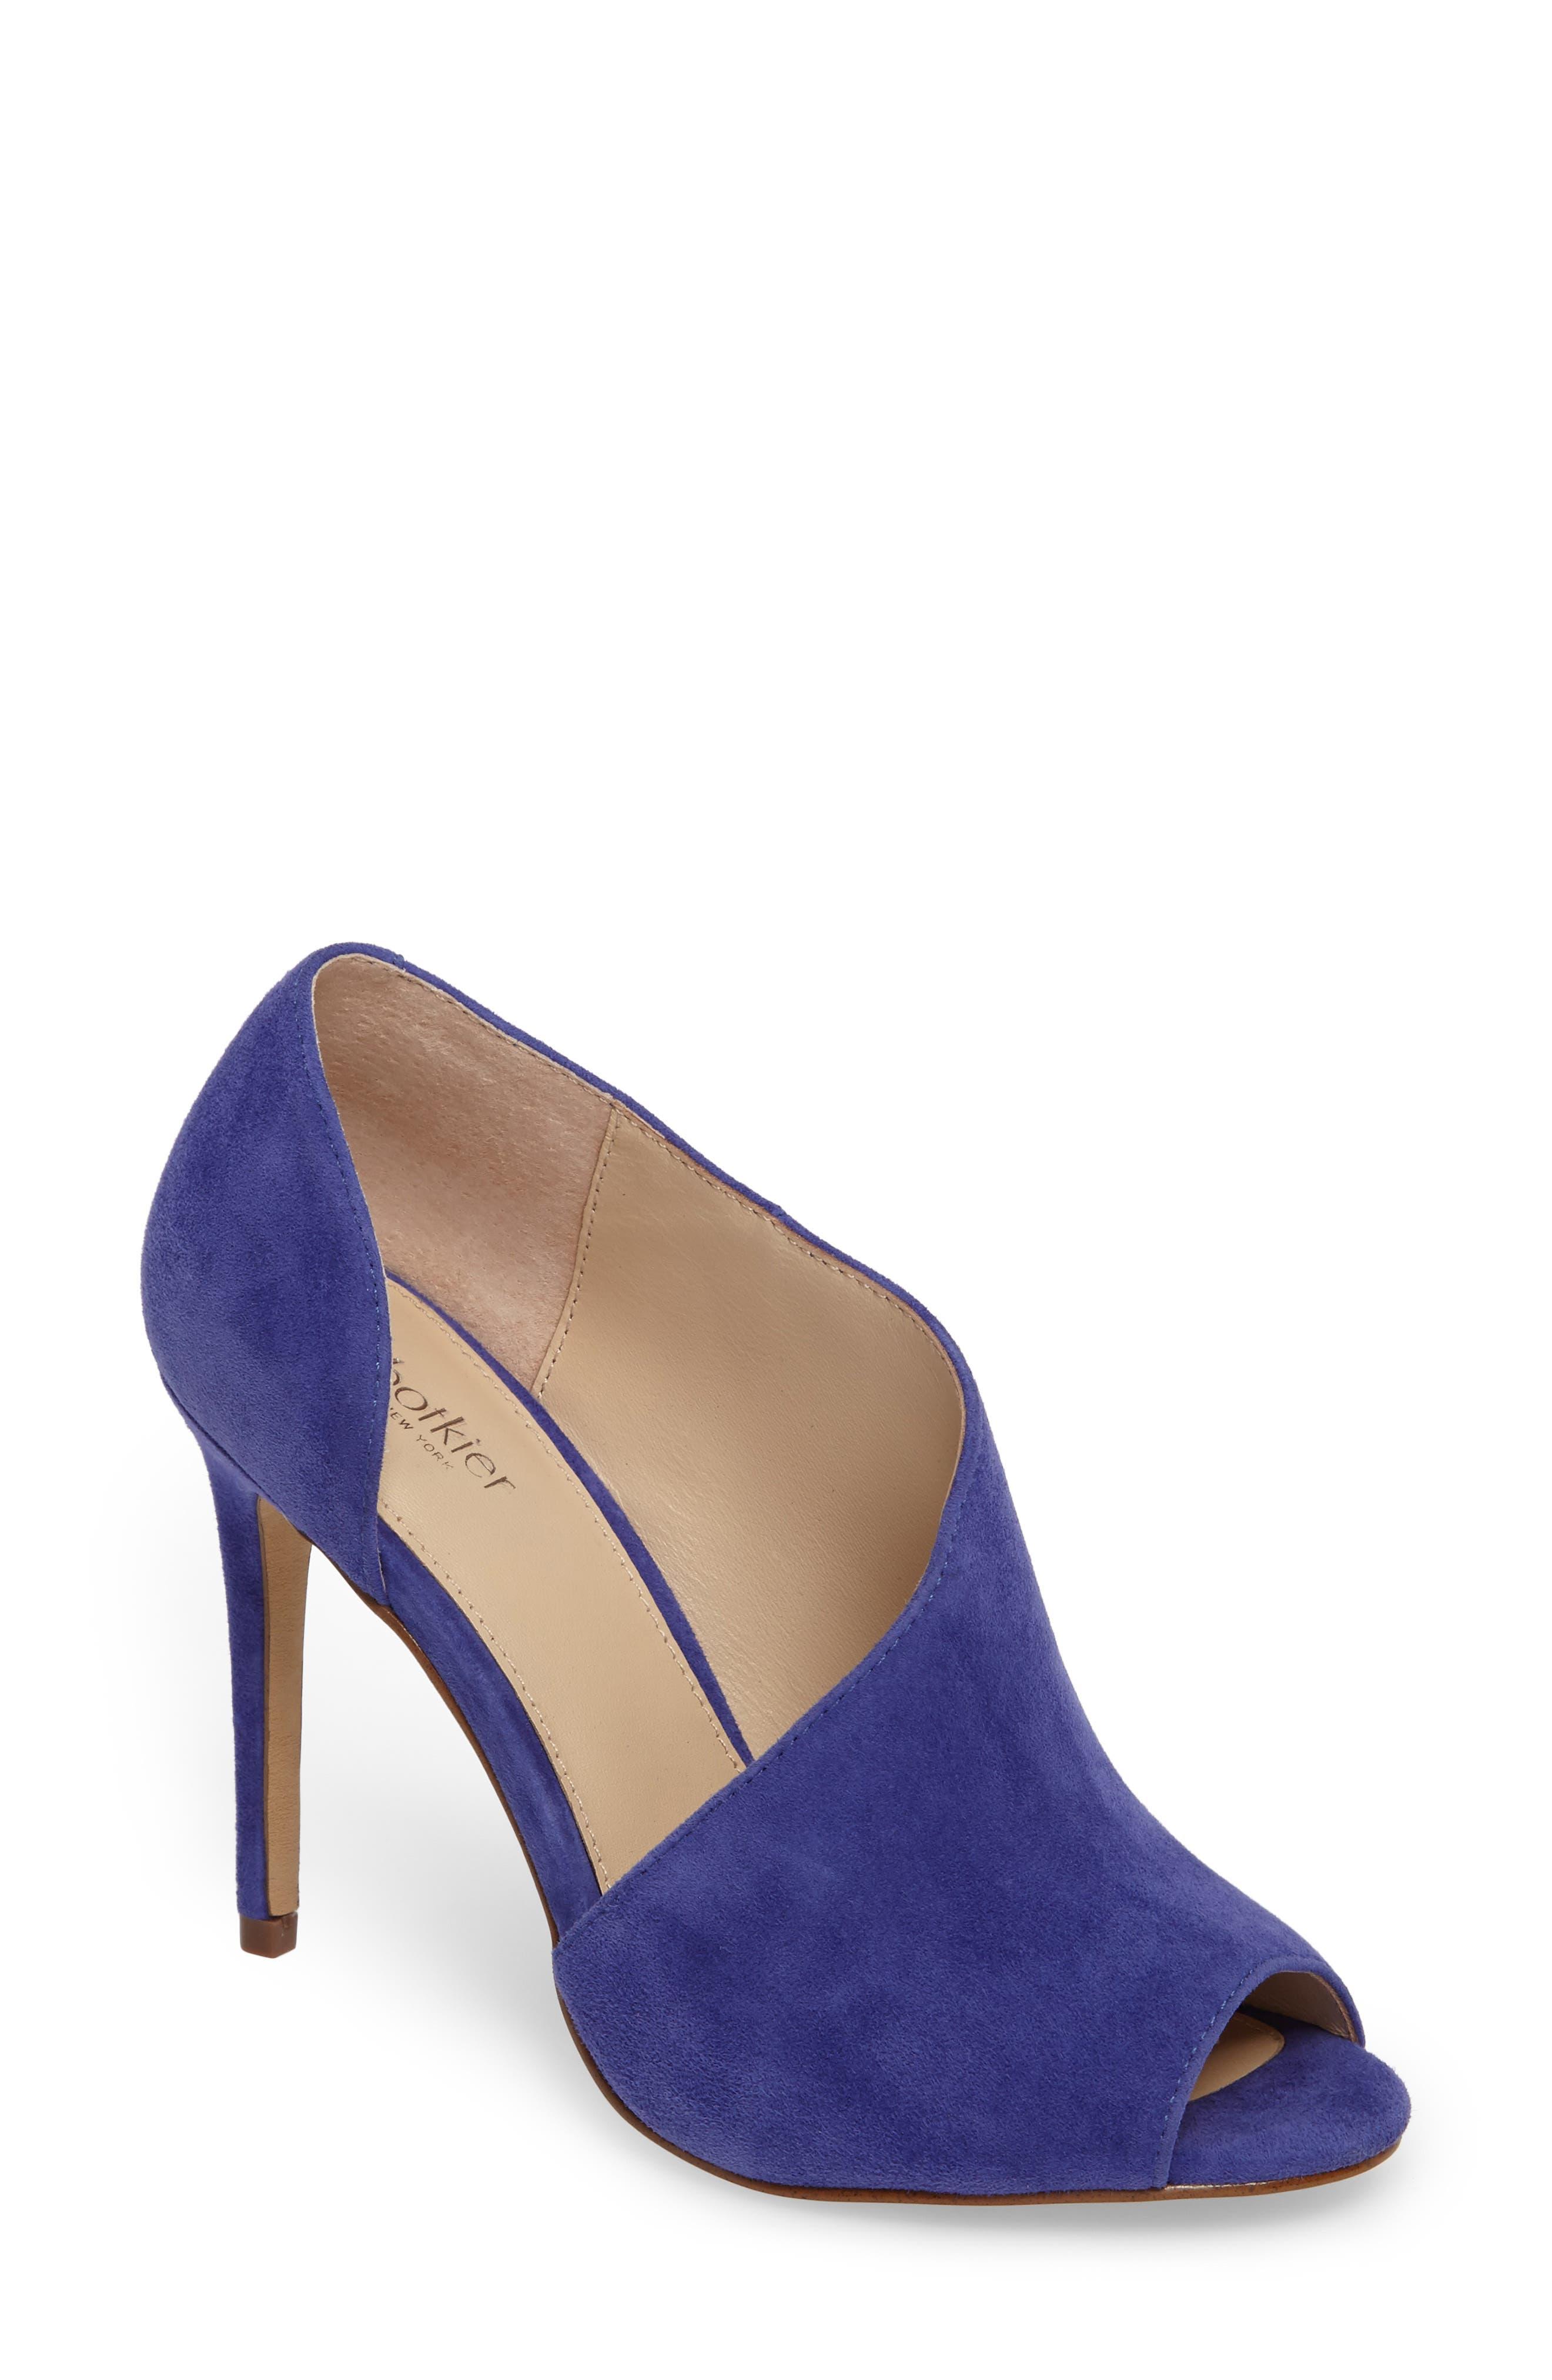 Adelia Asymmetrical Sandal,                         Main,                         color, Blue